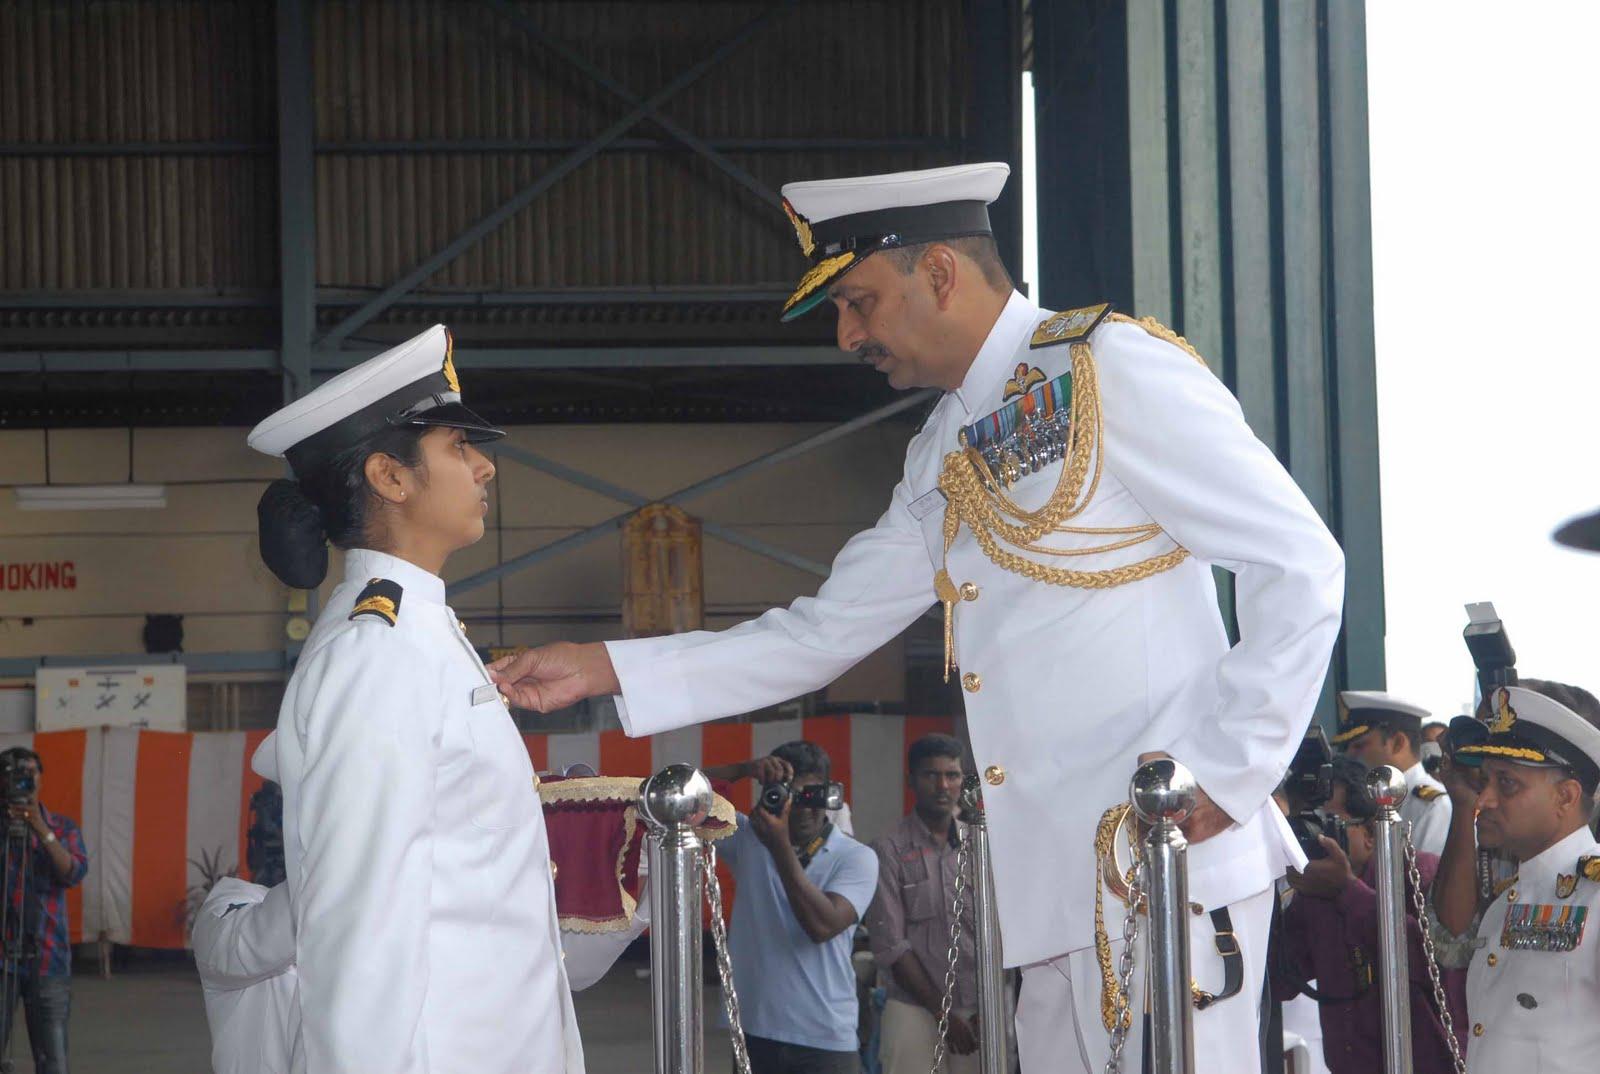 livefist  photos  the indian navy u0026 39 s first women aviators